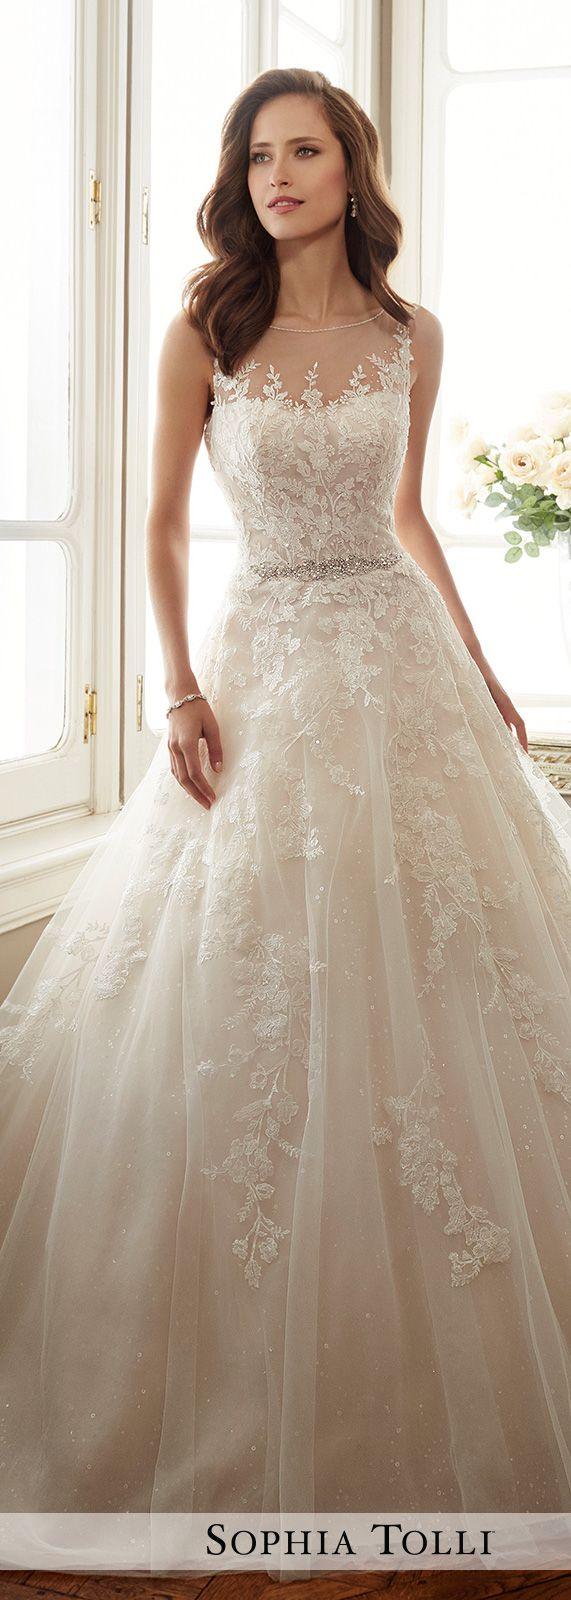 Wedding Dress by Sophia Tolli Spring 2017 Bridal Collection | Style No. ? Y11719 Monte